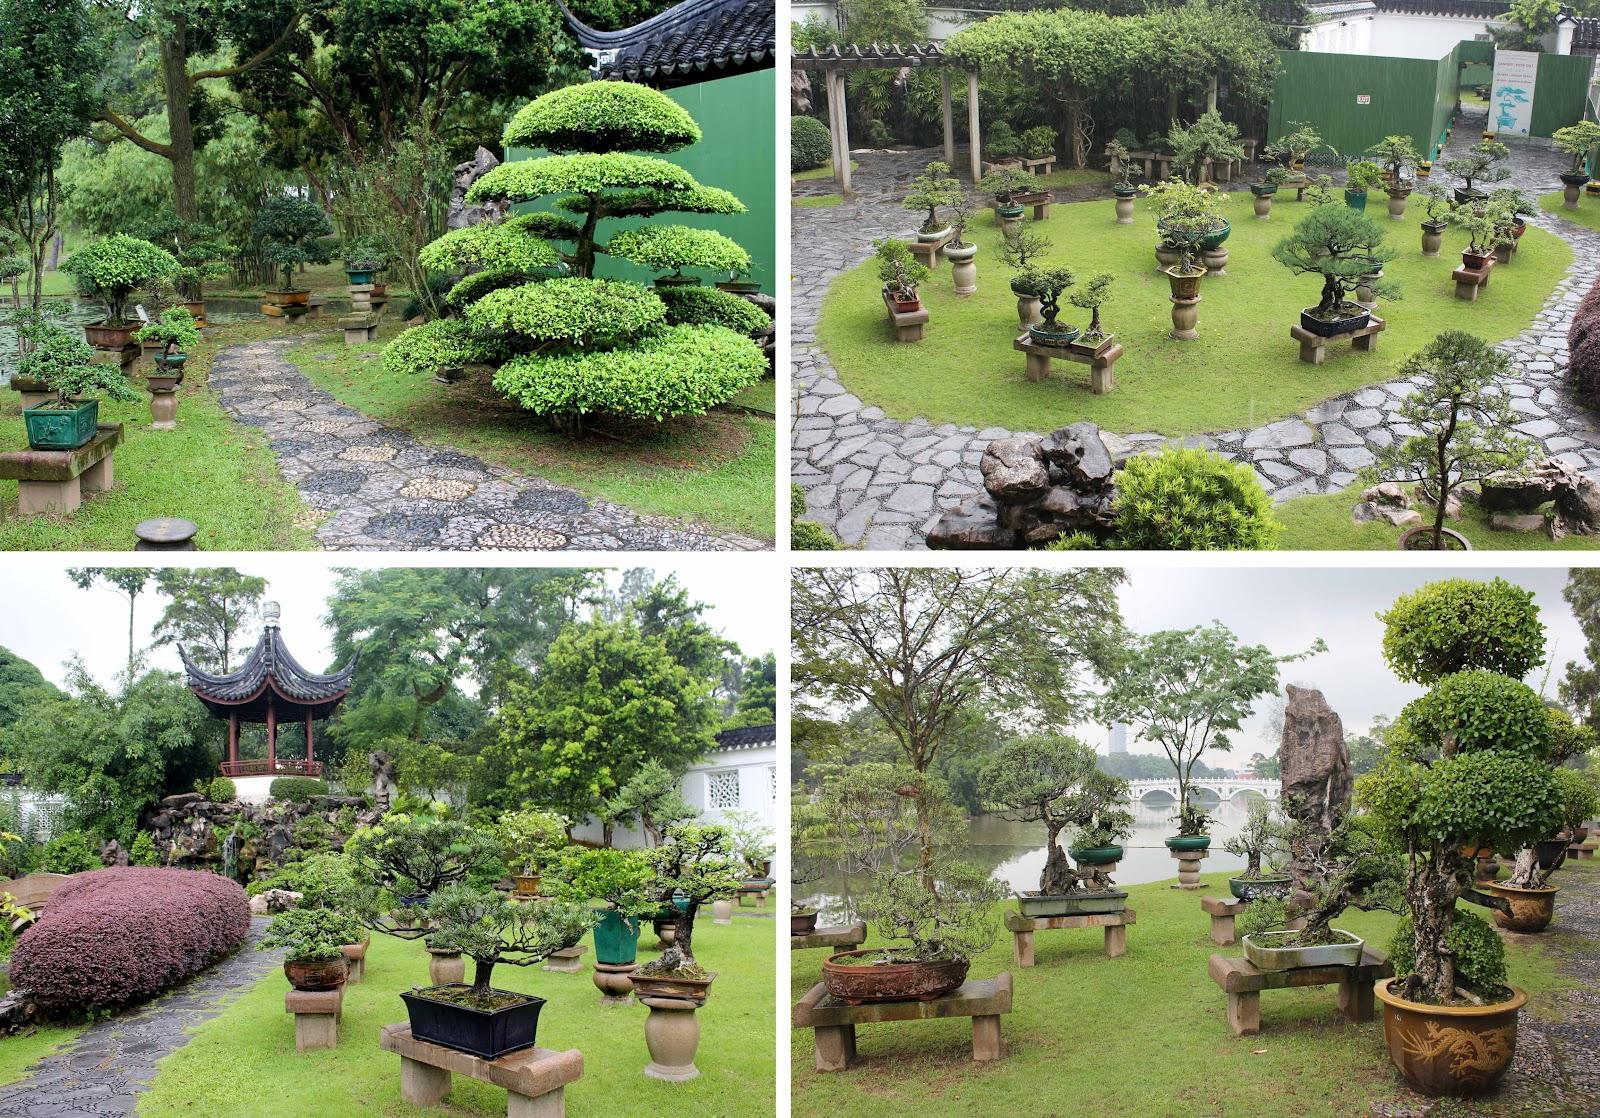 Kigawa39s Bonsai Blog Penjing At Singapore Chinese Garden